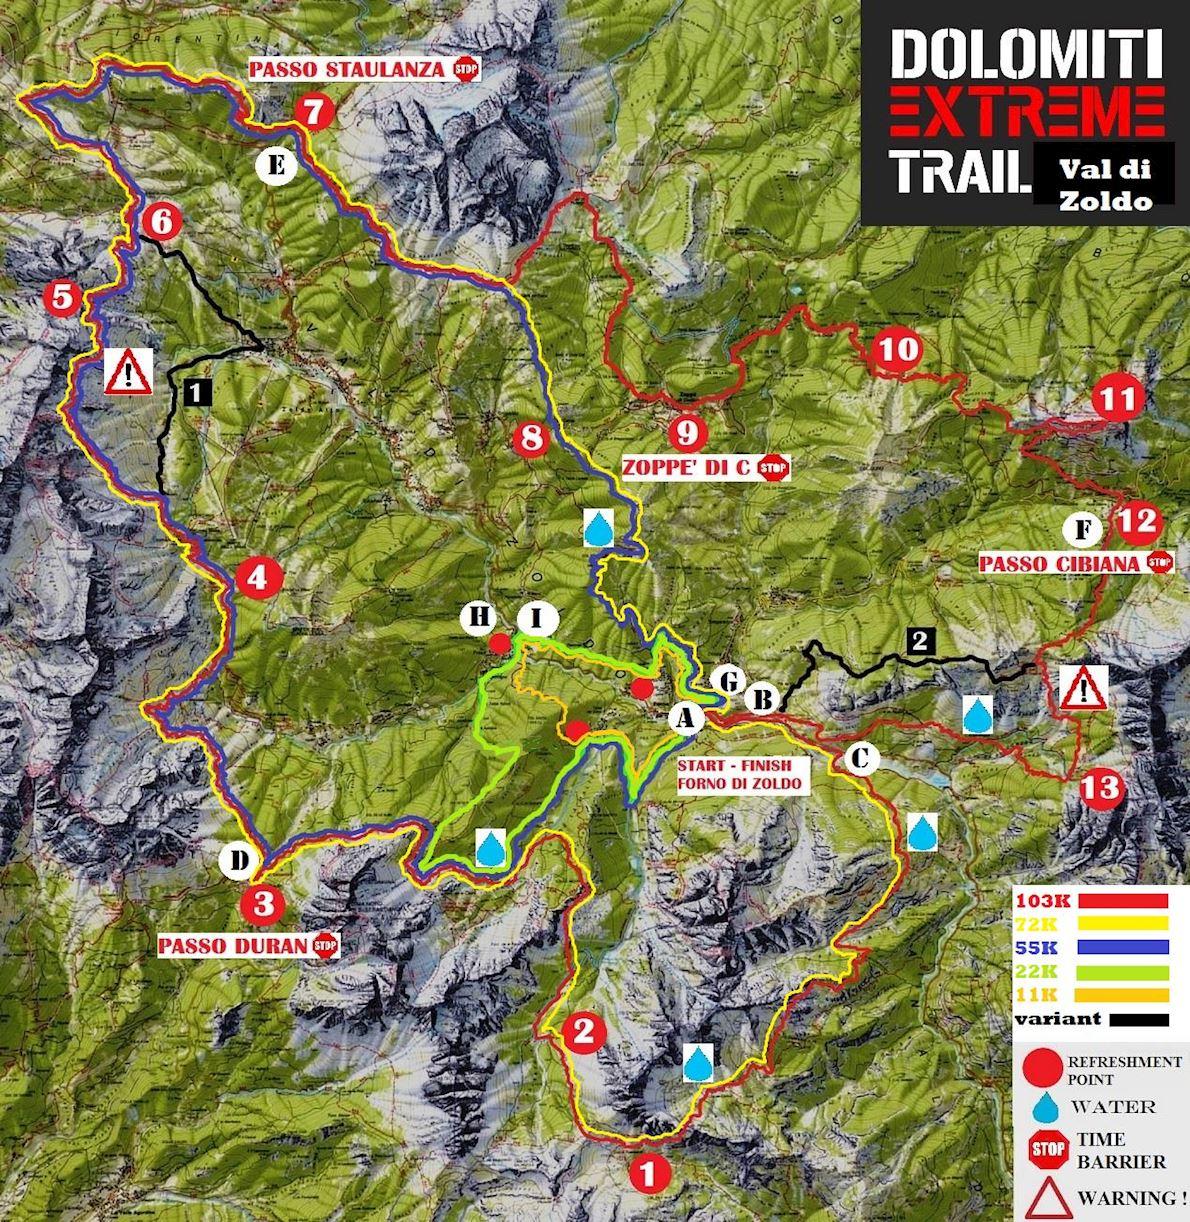 Dolomiti Extreme Trail Route Map